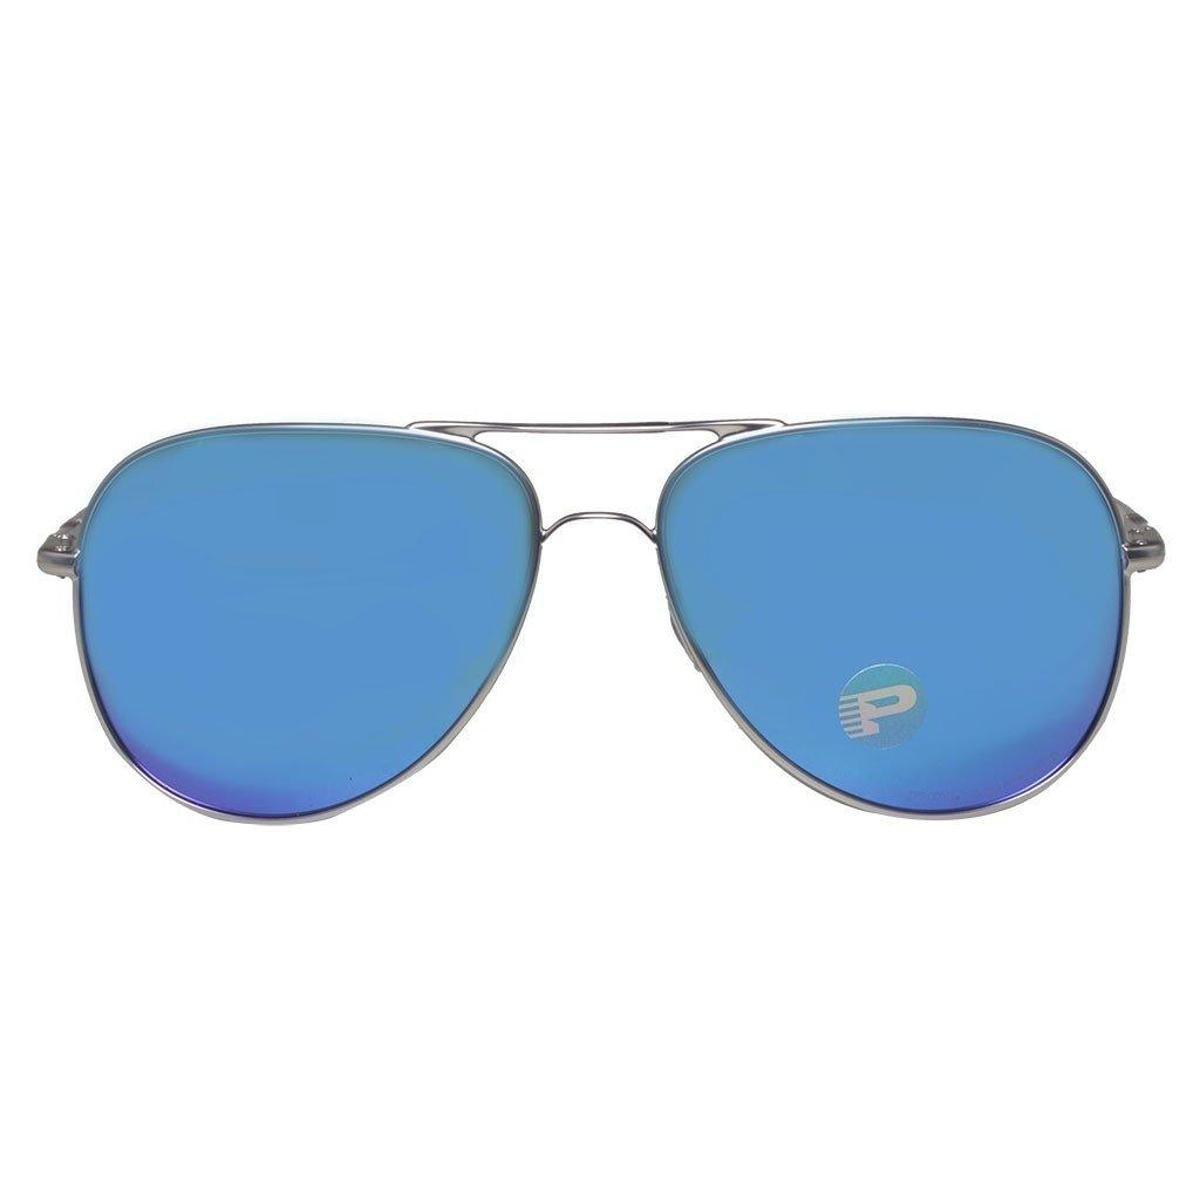 Óculos Oakley Elmont L Stn Chrome Sapph Iridium Polarizado - Compre ... 10321041ba